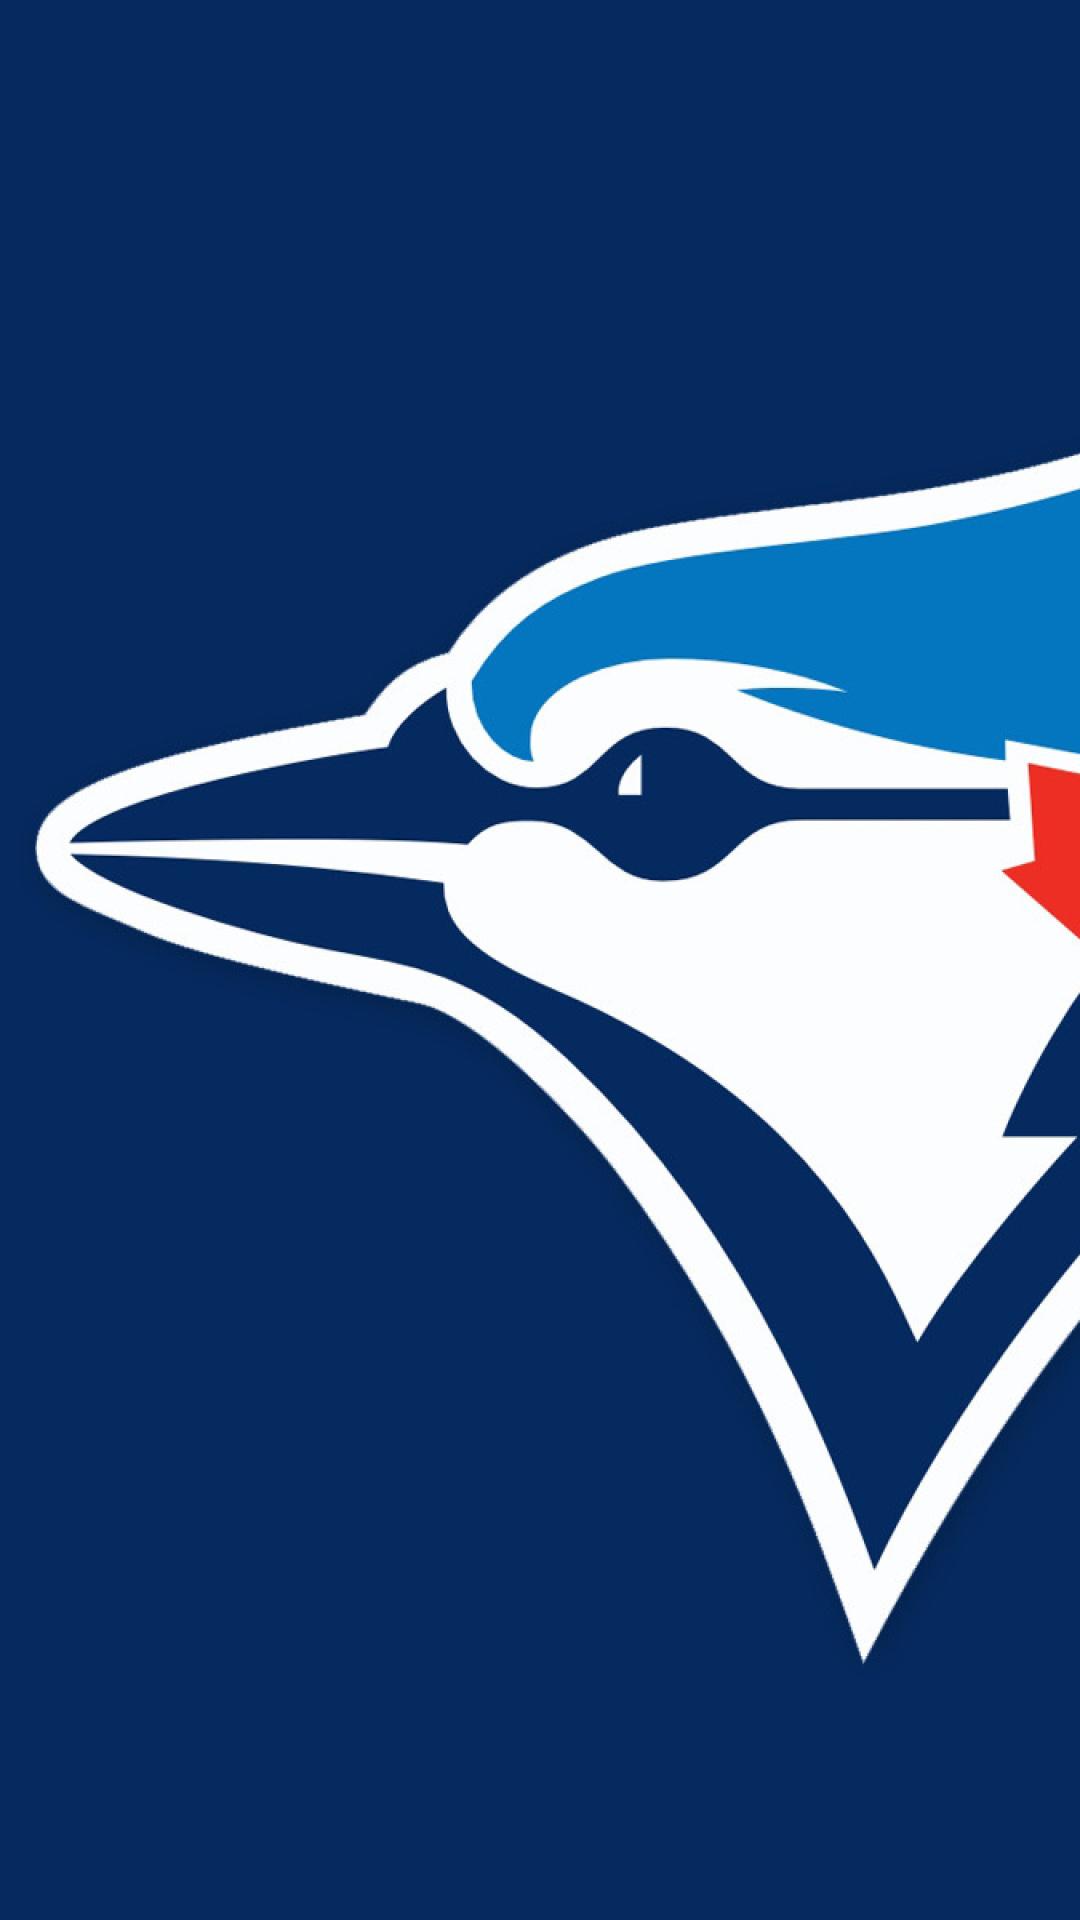 Free Download Toronto Blue Jays Wallpapers 49 Toronto Blue Jays Hd